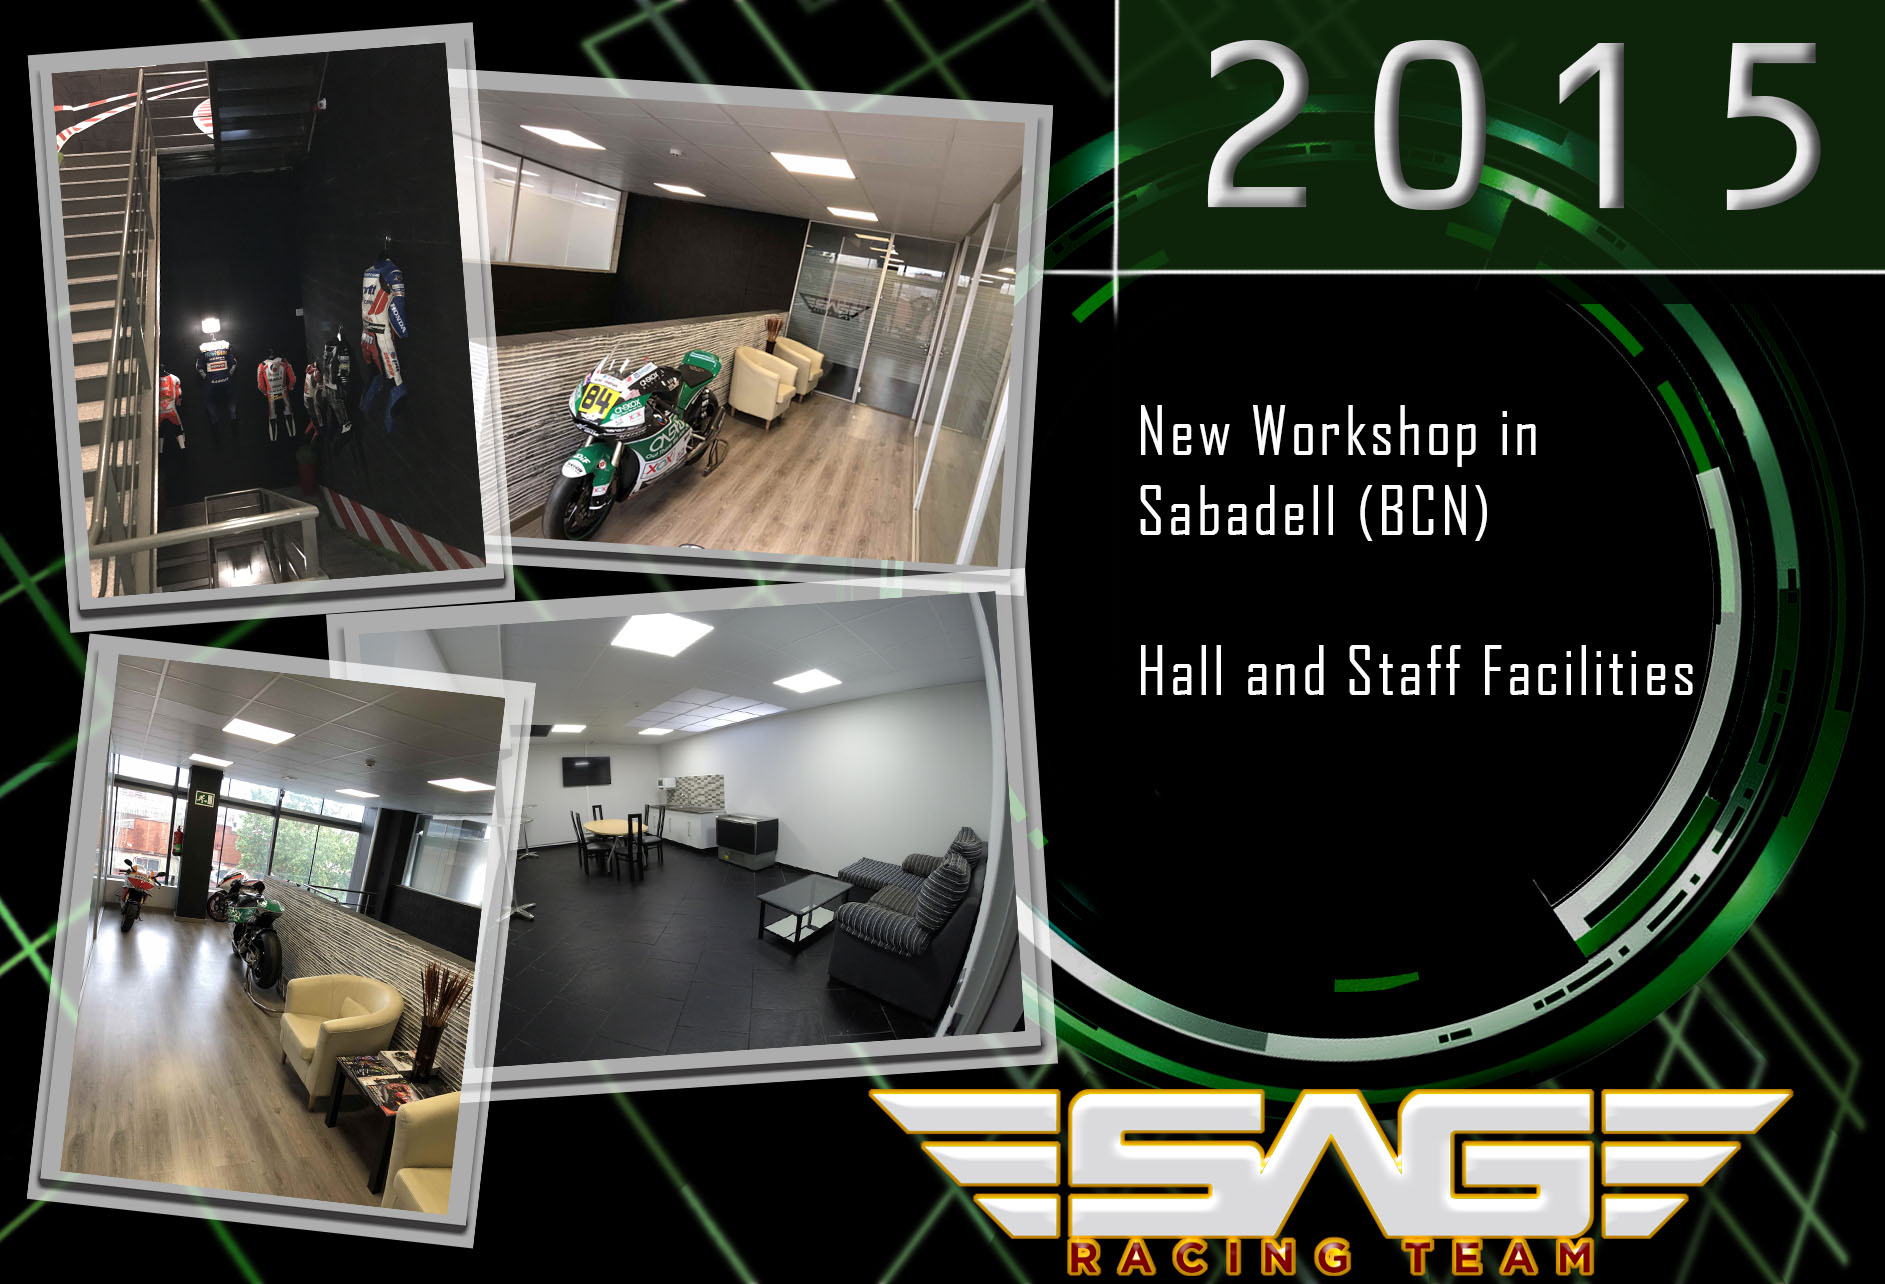 Hall and staff facilities